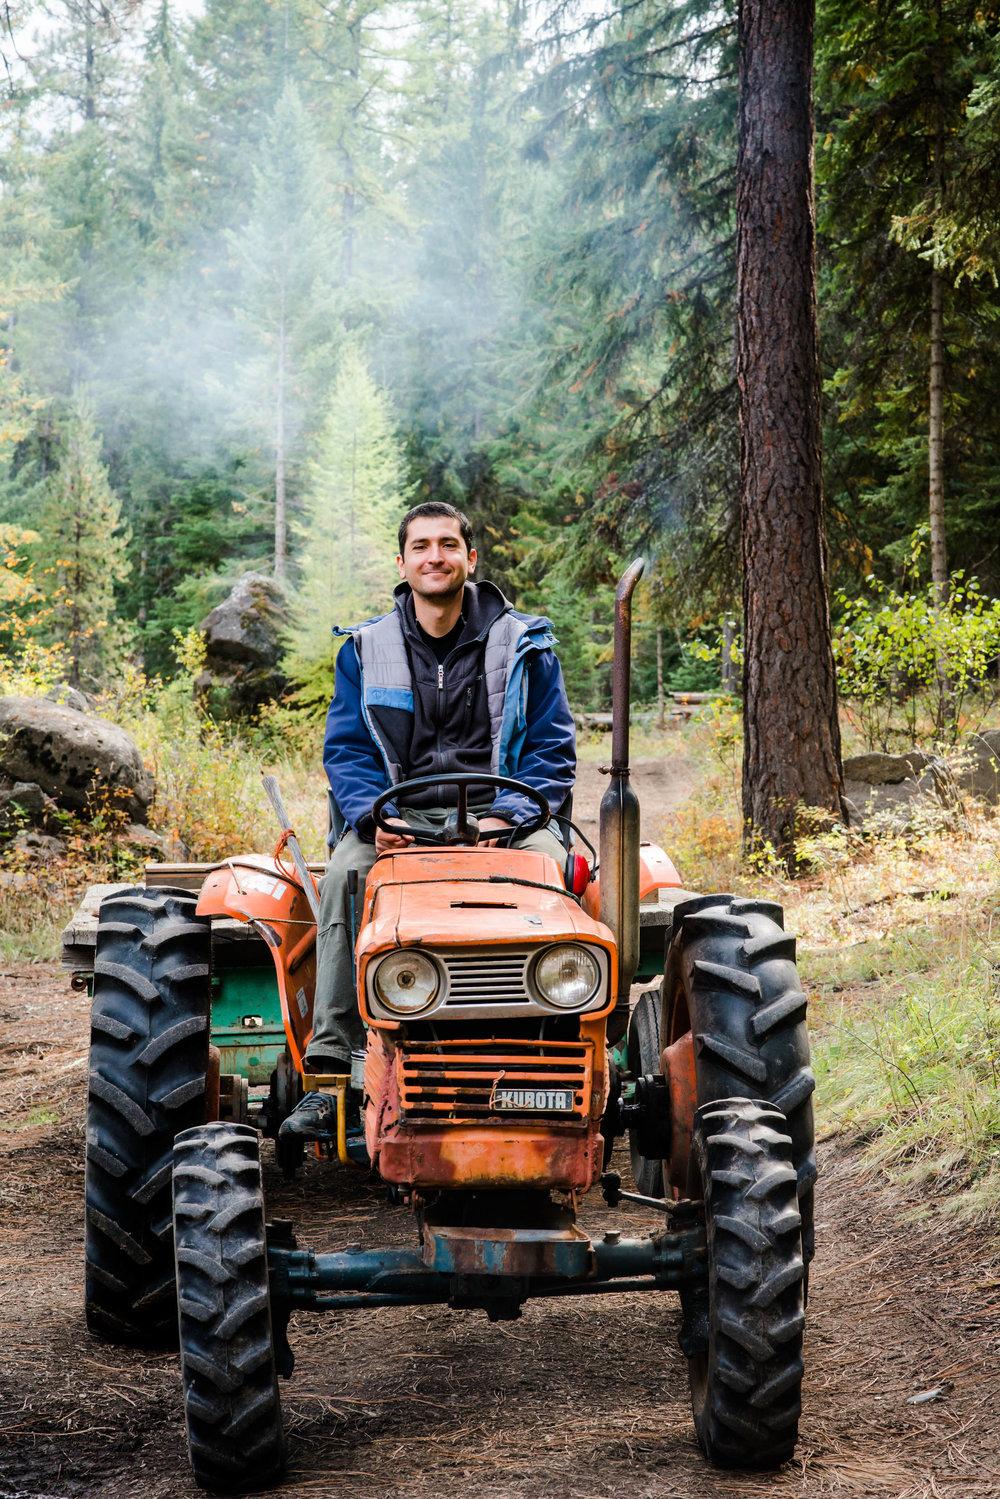 Minam_River_Lodge_Wallowa_Mountains_Eagle_Cap_Wilderness_Oregon_Autumn_2017_Please_Credit_Talia_Jean_Galvin-105.jpg